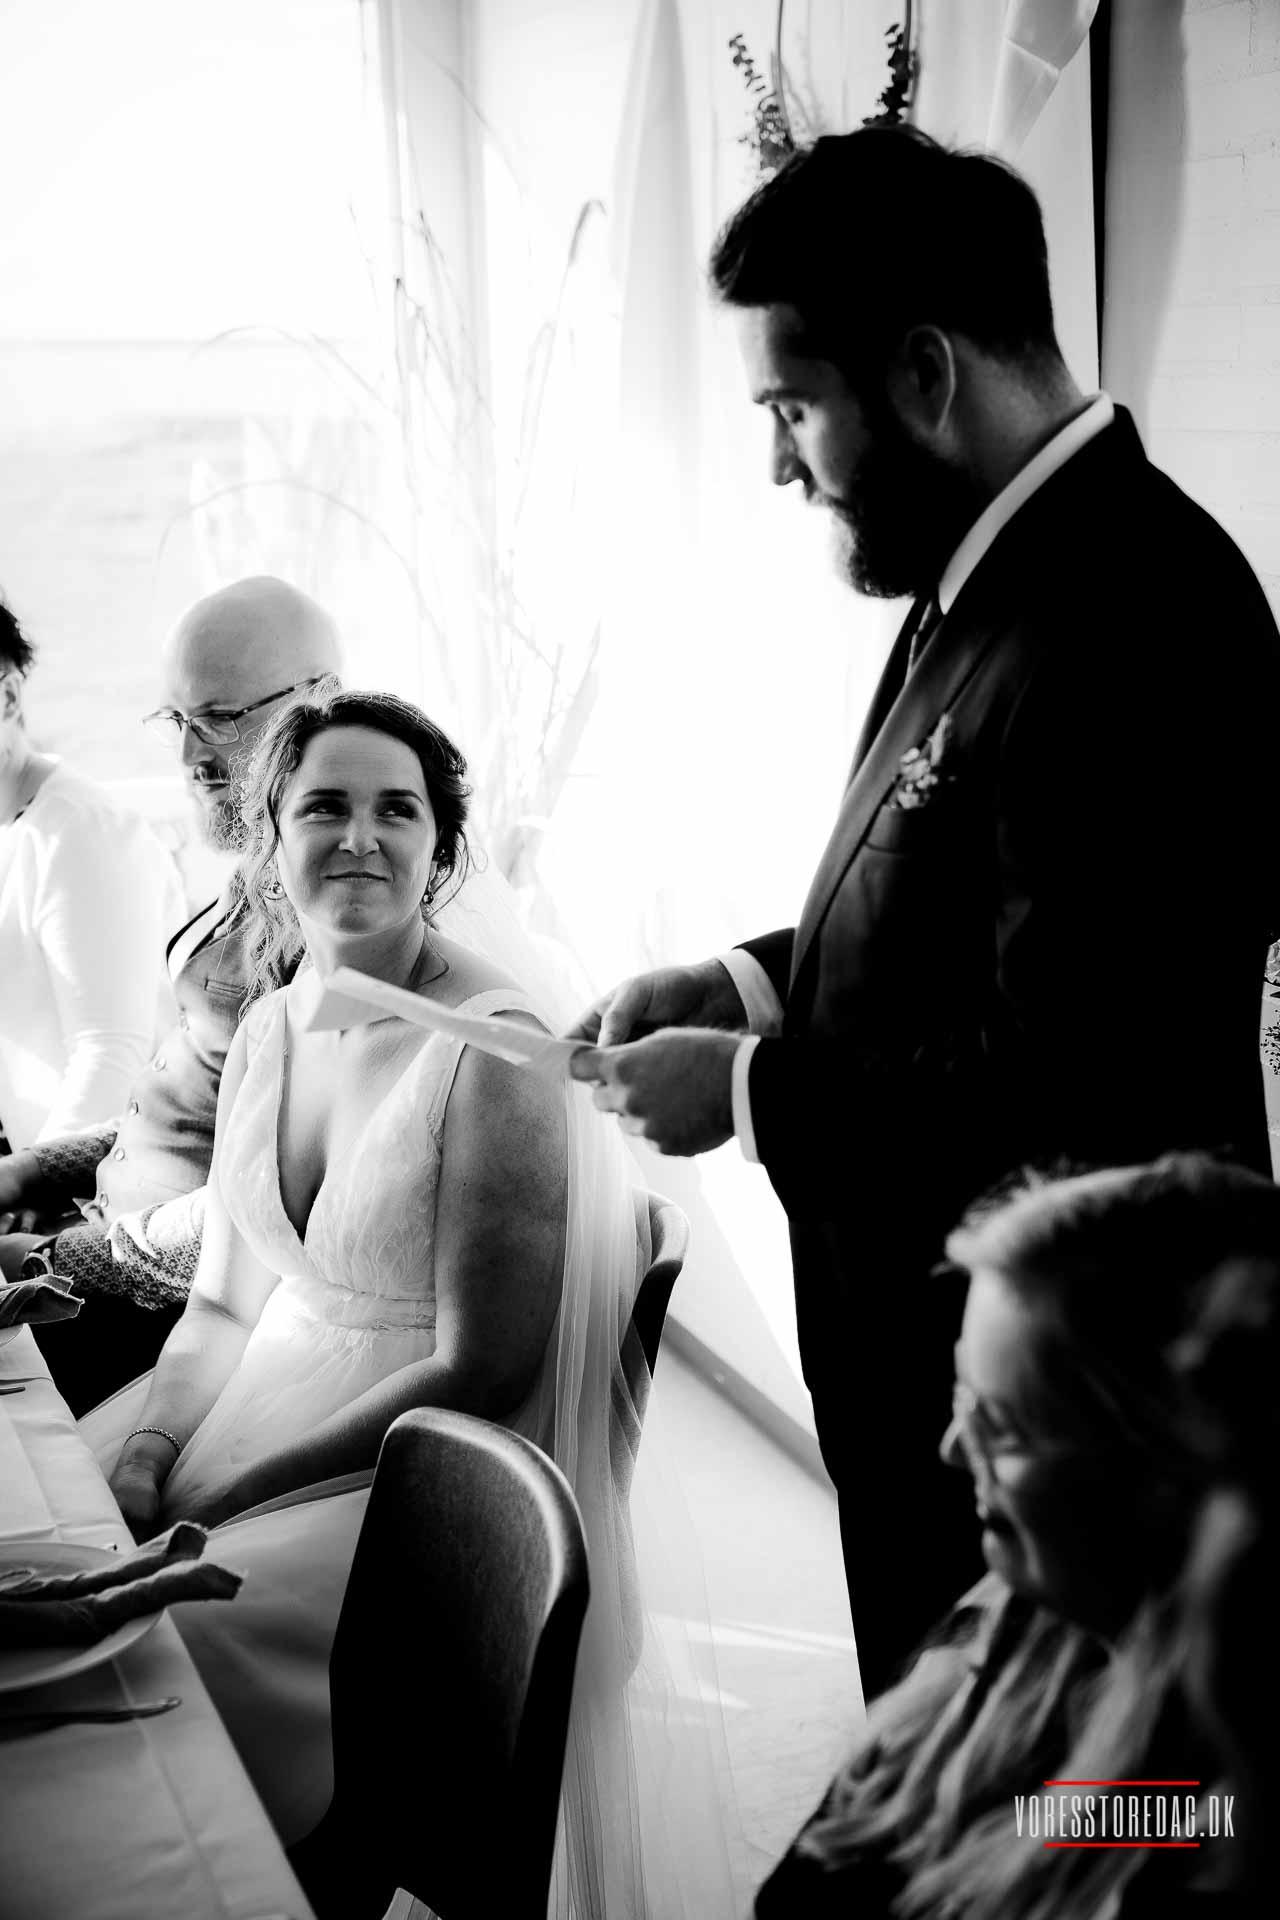 Bryllupsmad | Mad til bryllup inspiration og ideer